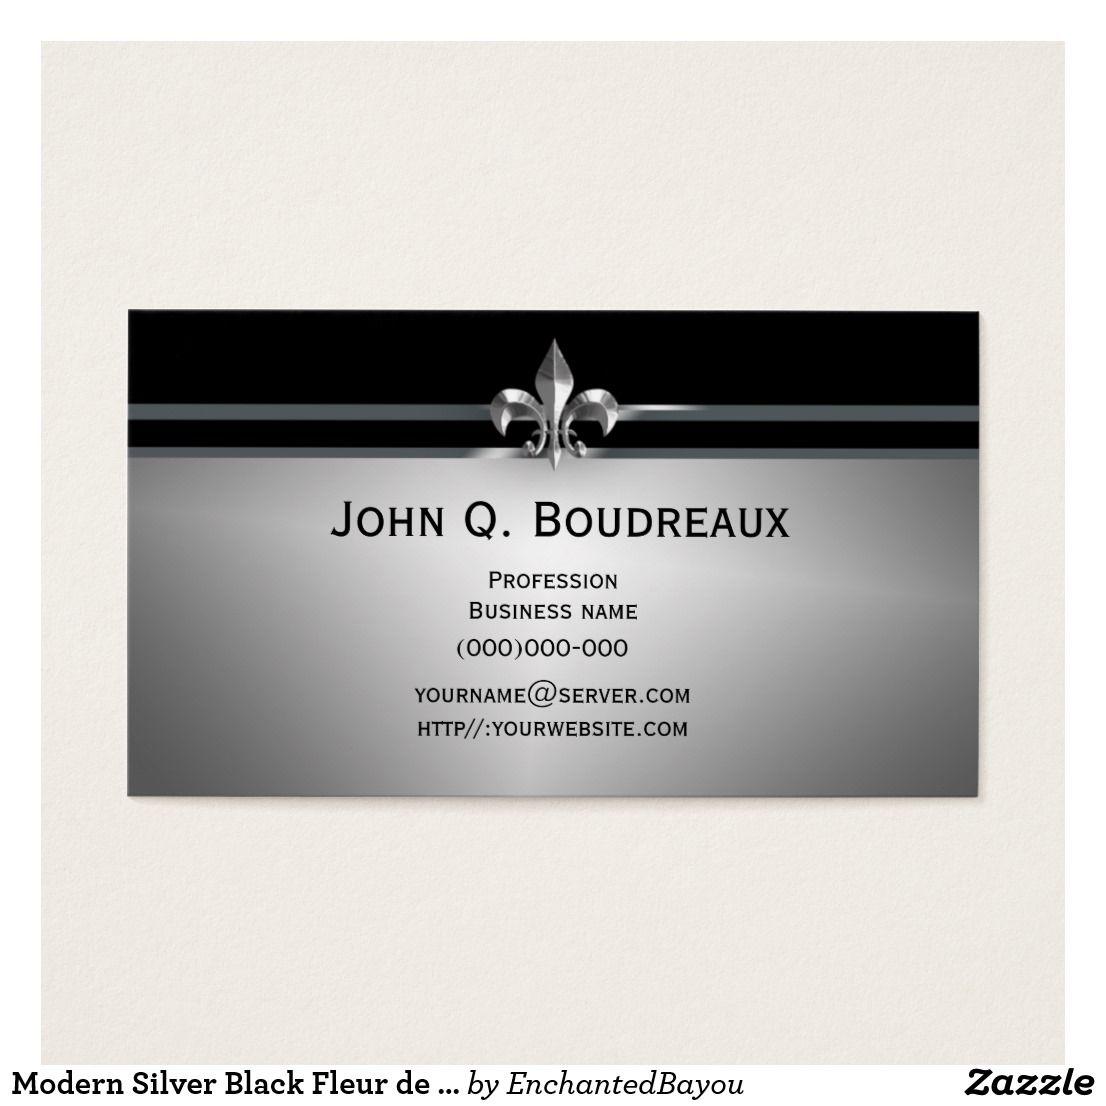 Modern Silver Black Fleur De Lis Business Card Zazzle Com Cards Business Cards Fleur De Lis